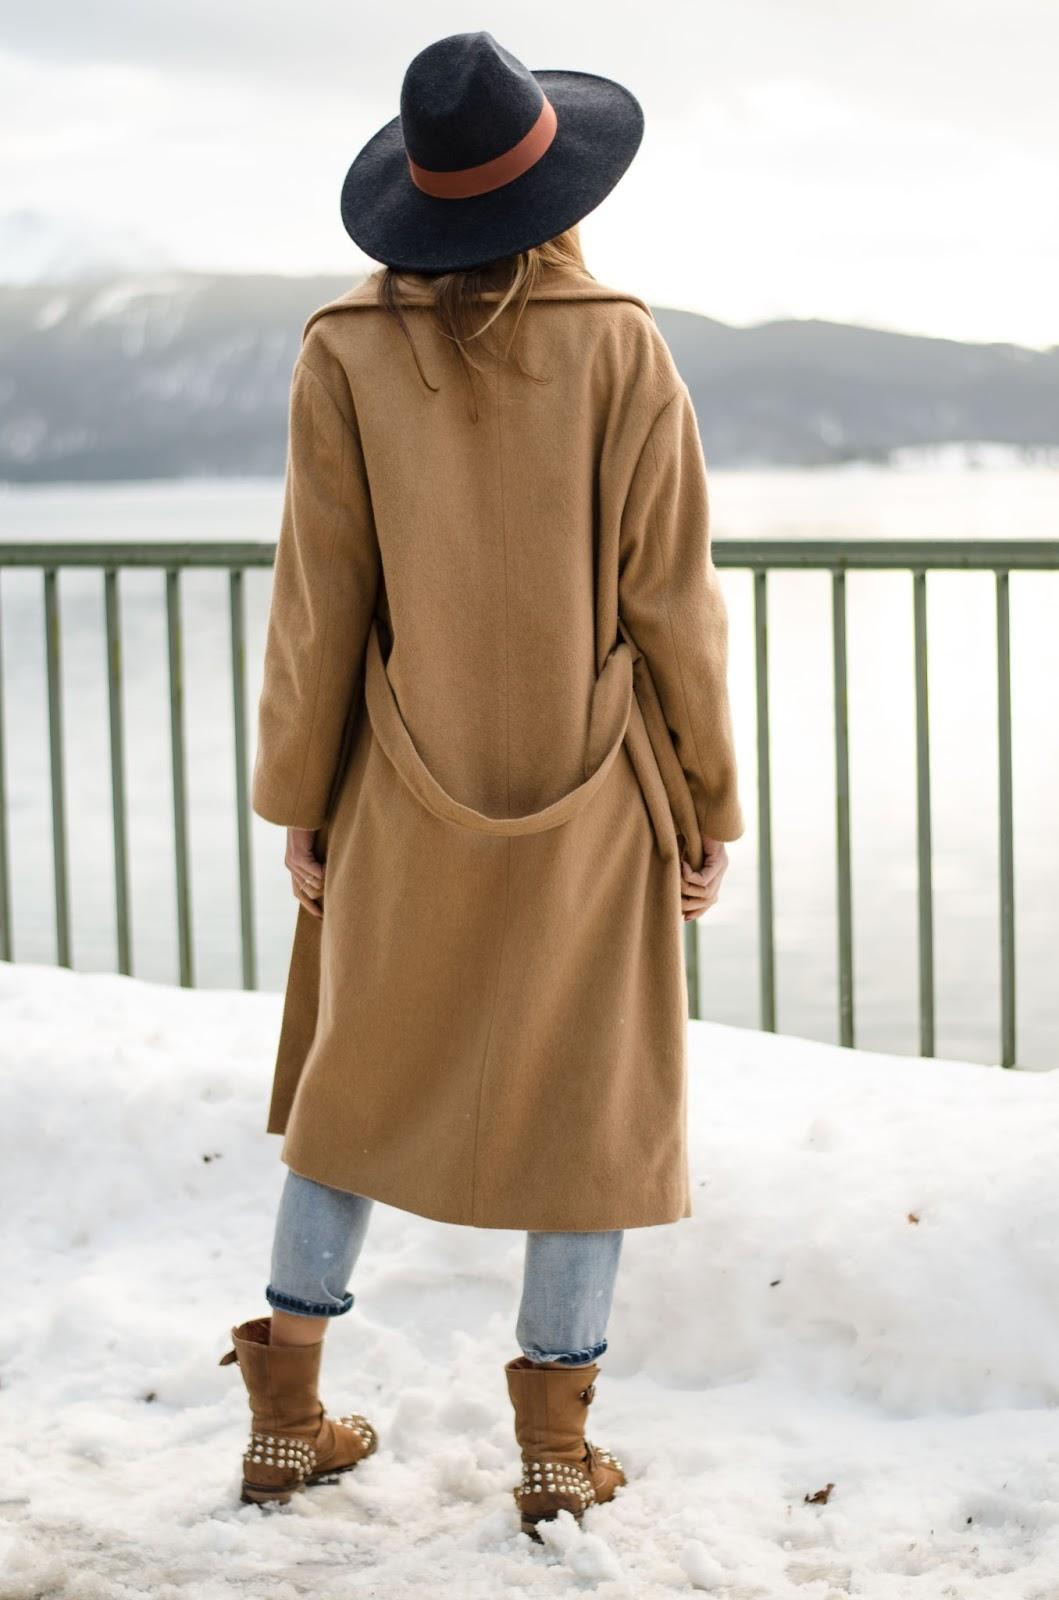 kristjaana mere camel coat boyfriend jeans ankle boots fedora snow